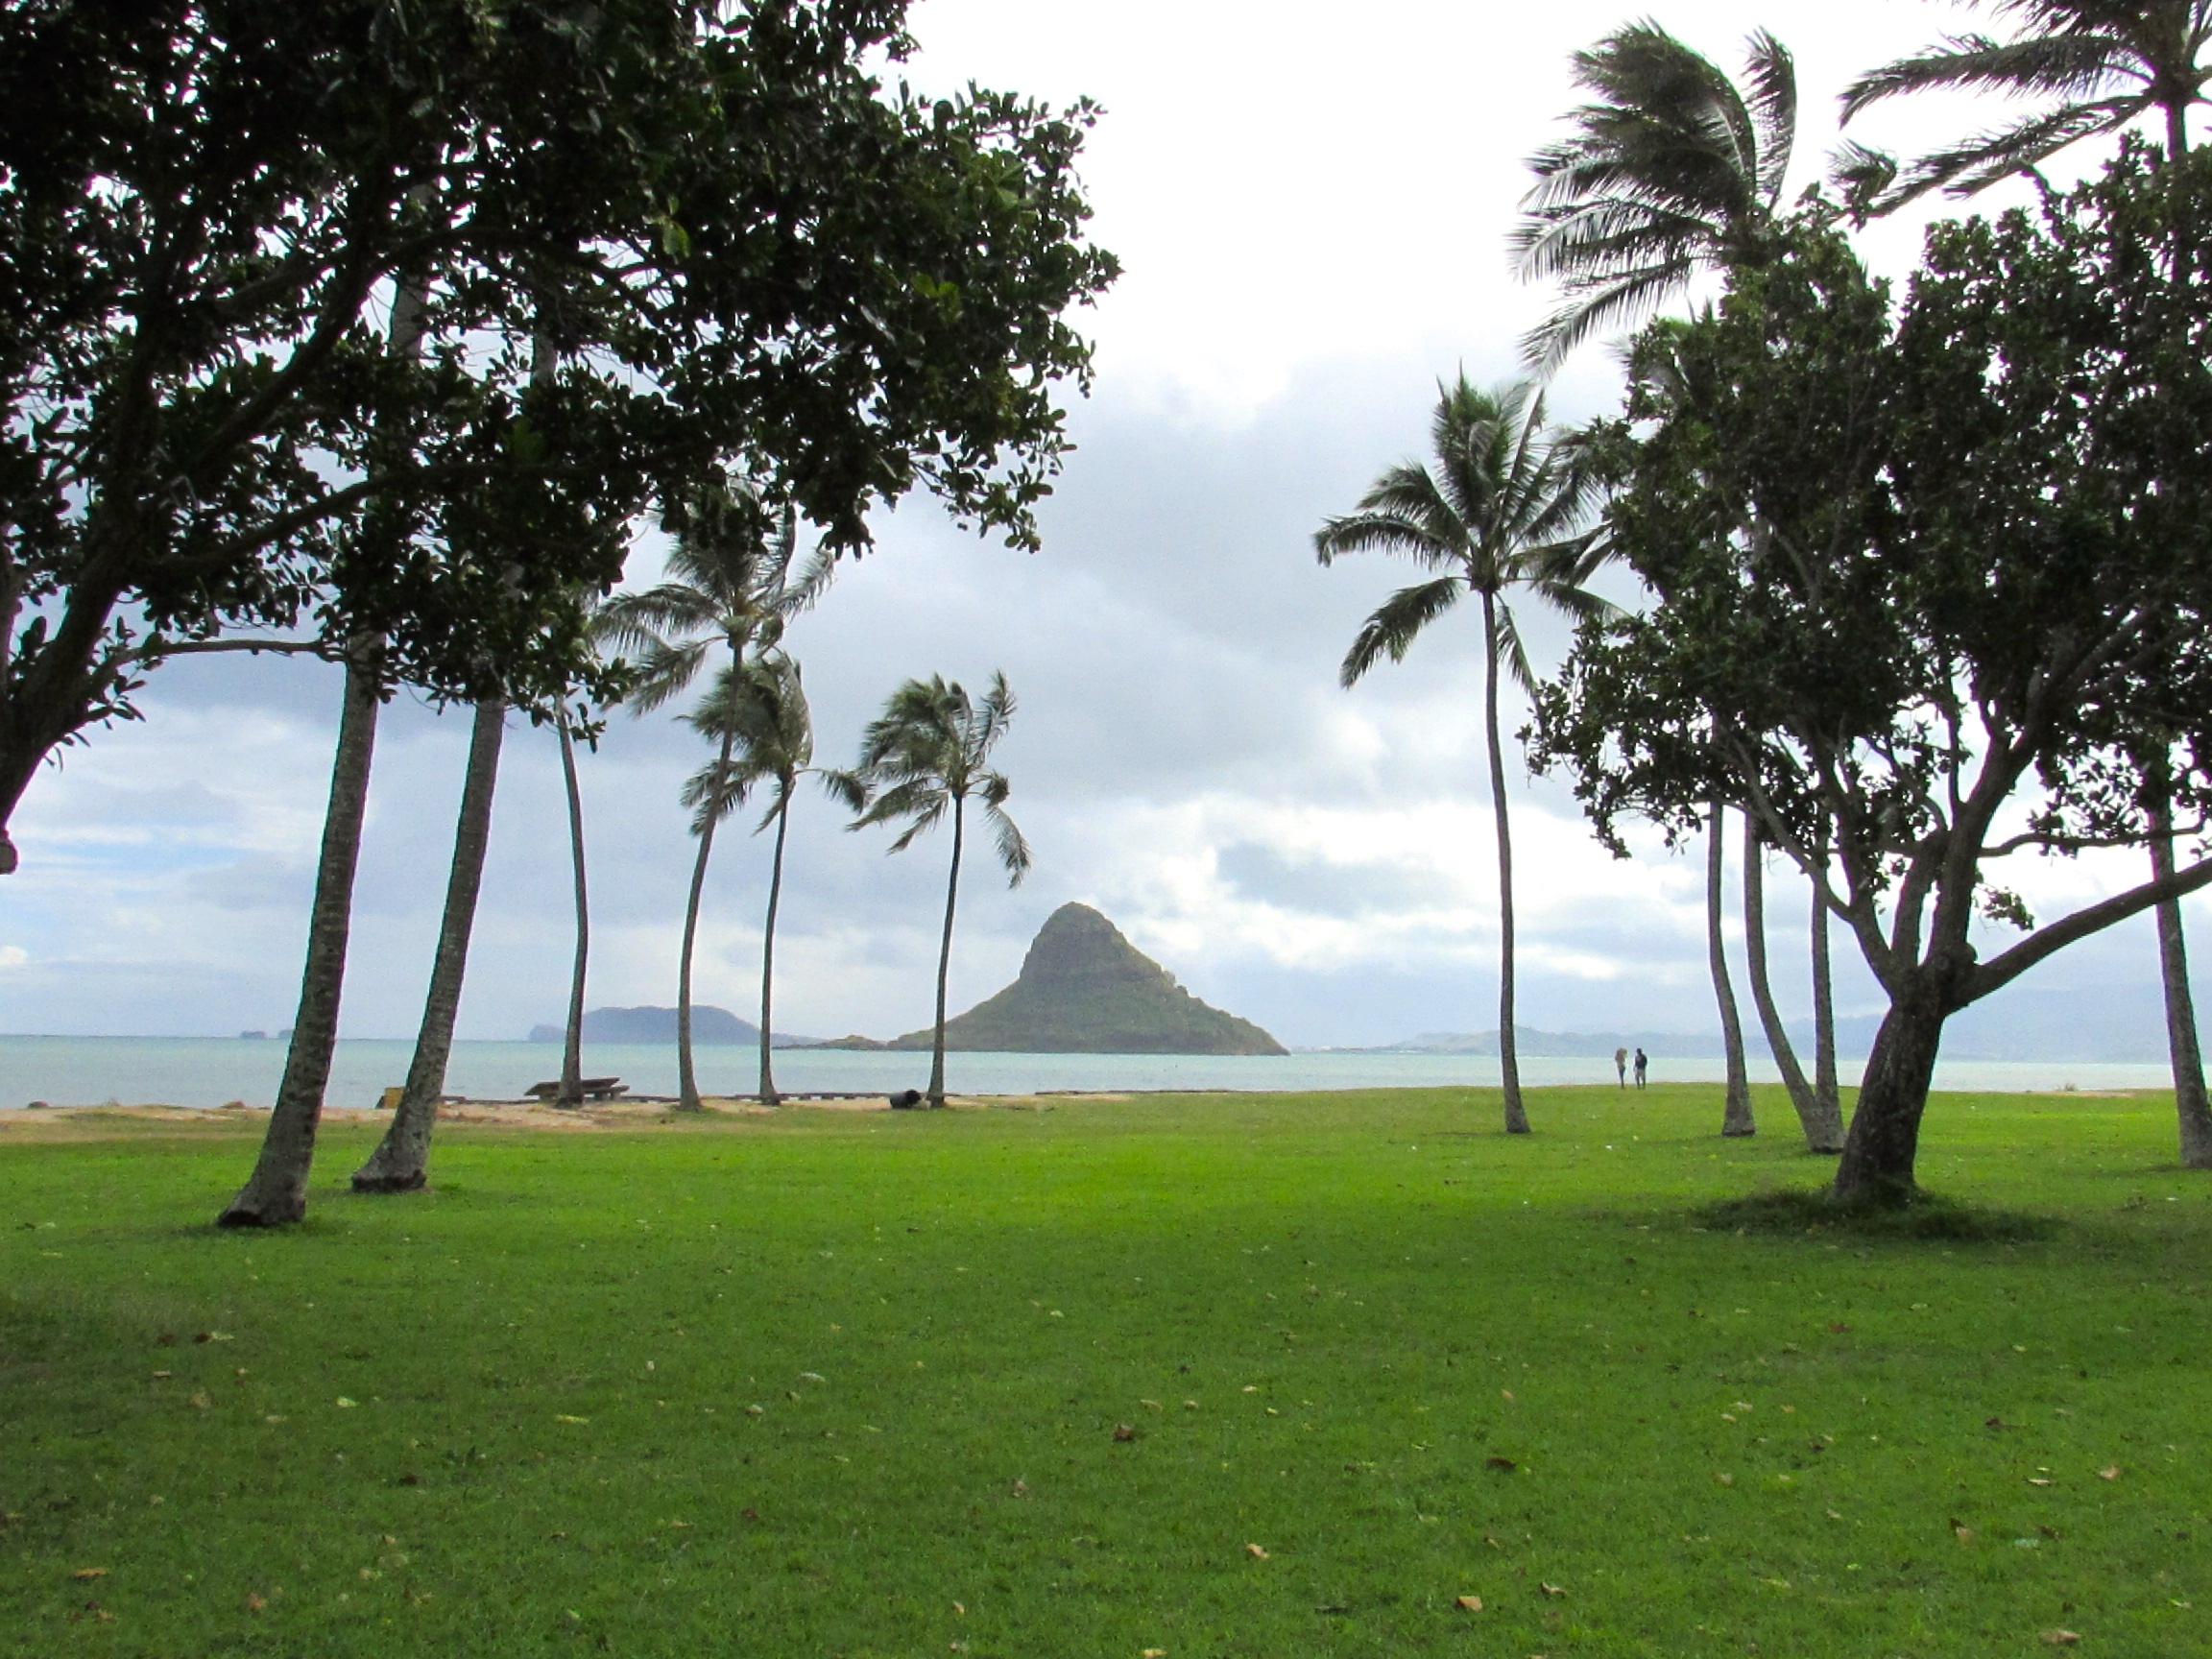 The small island of Mokoli'i (aka Chinaman's Hat) off the coast of Oahu